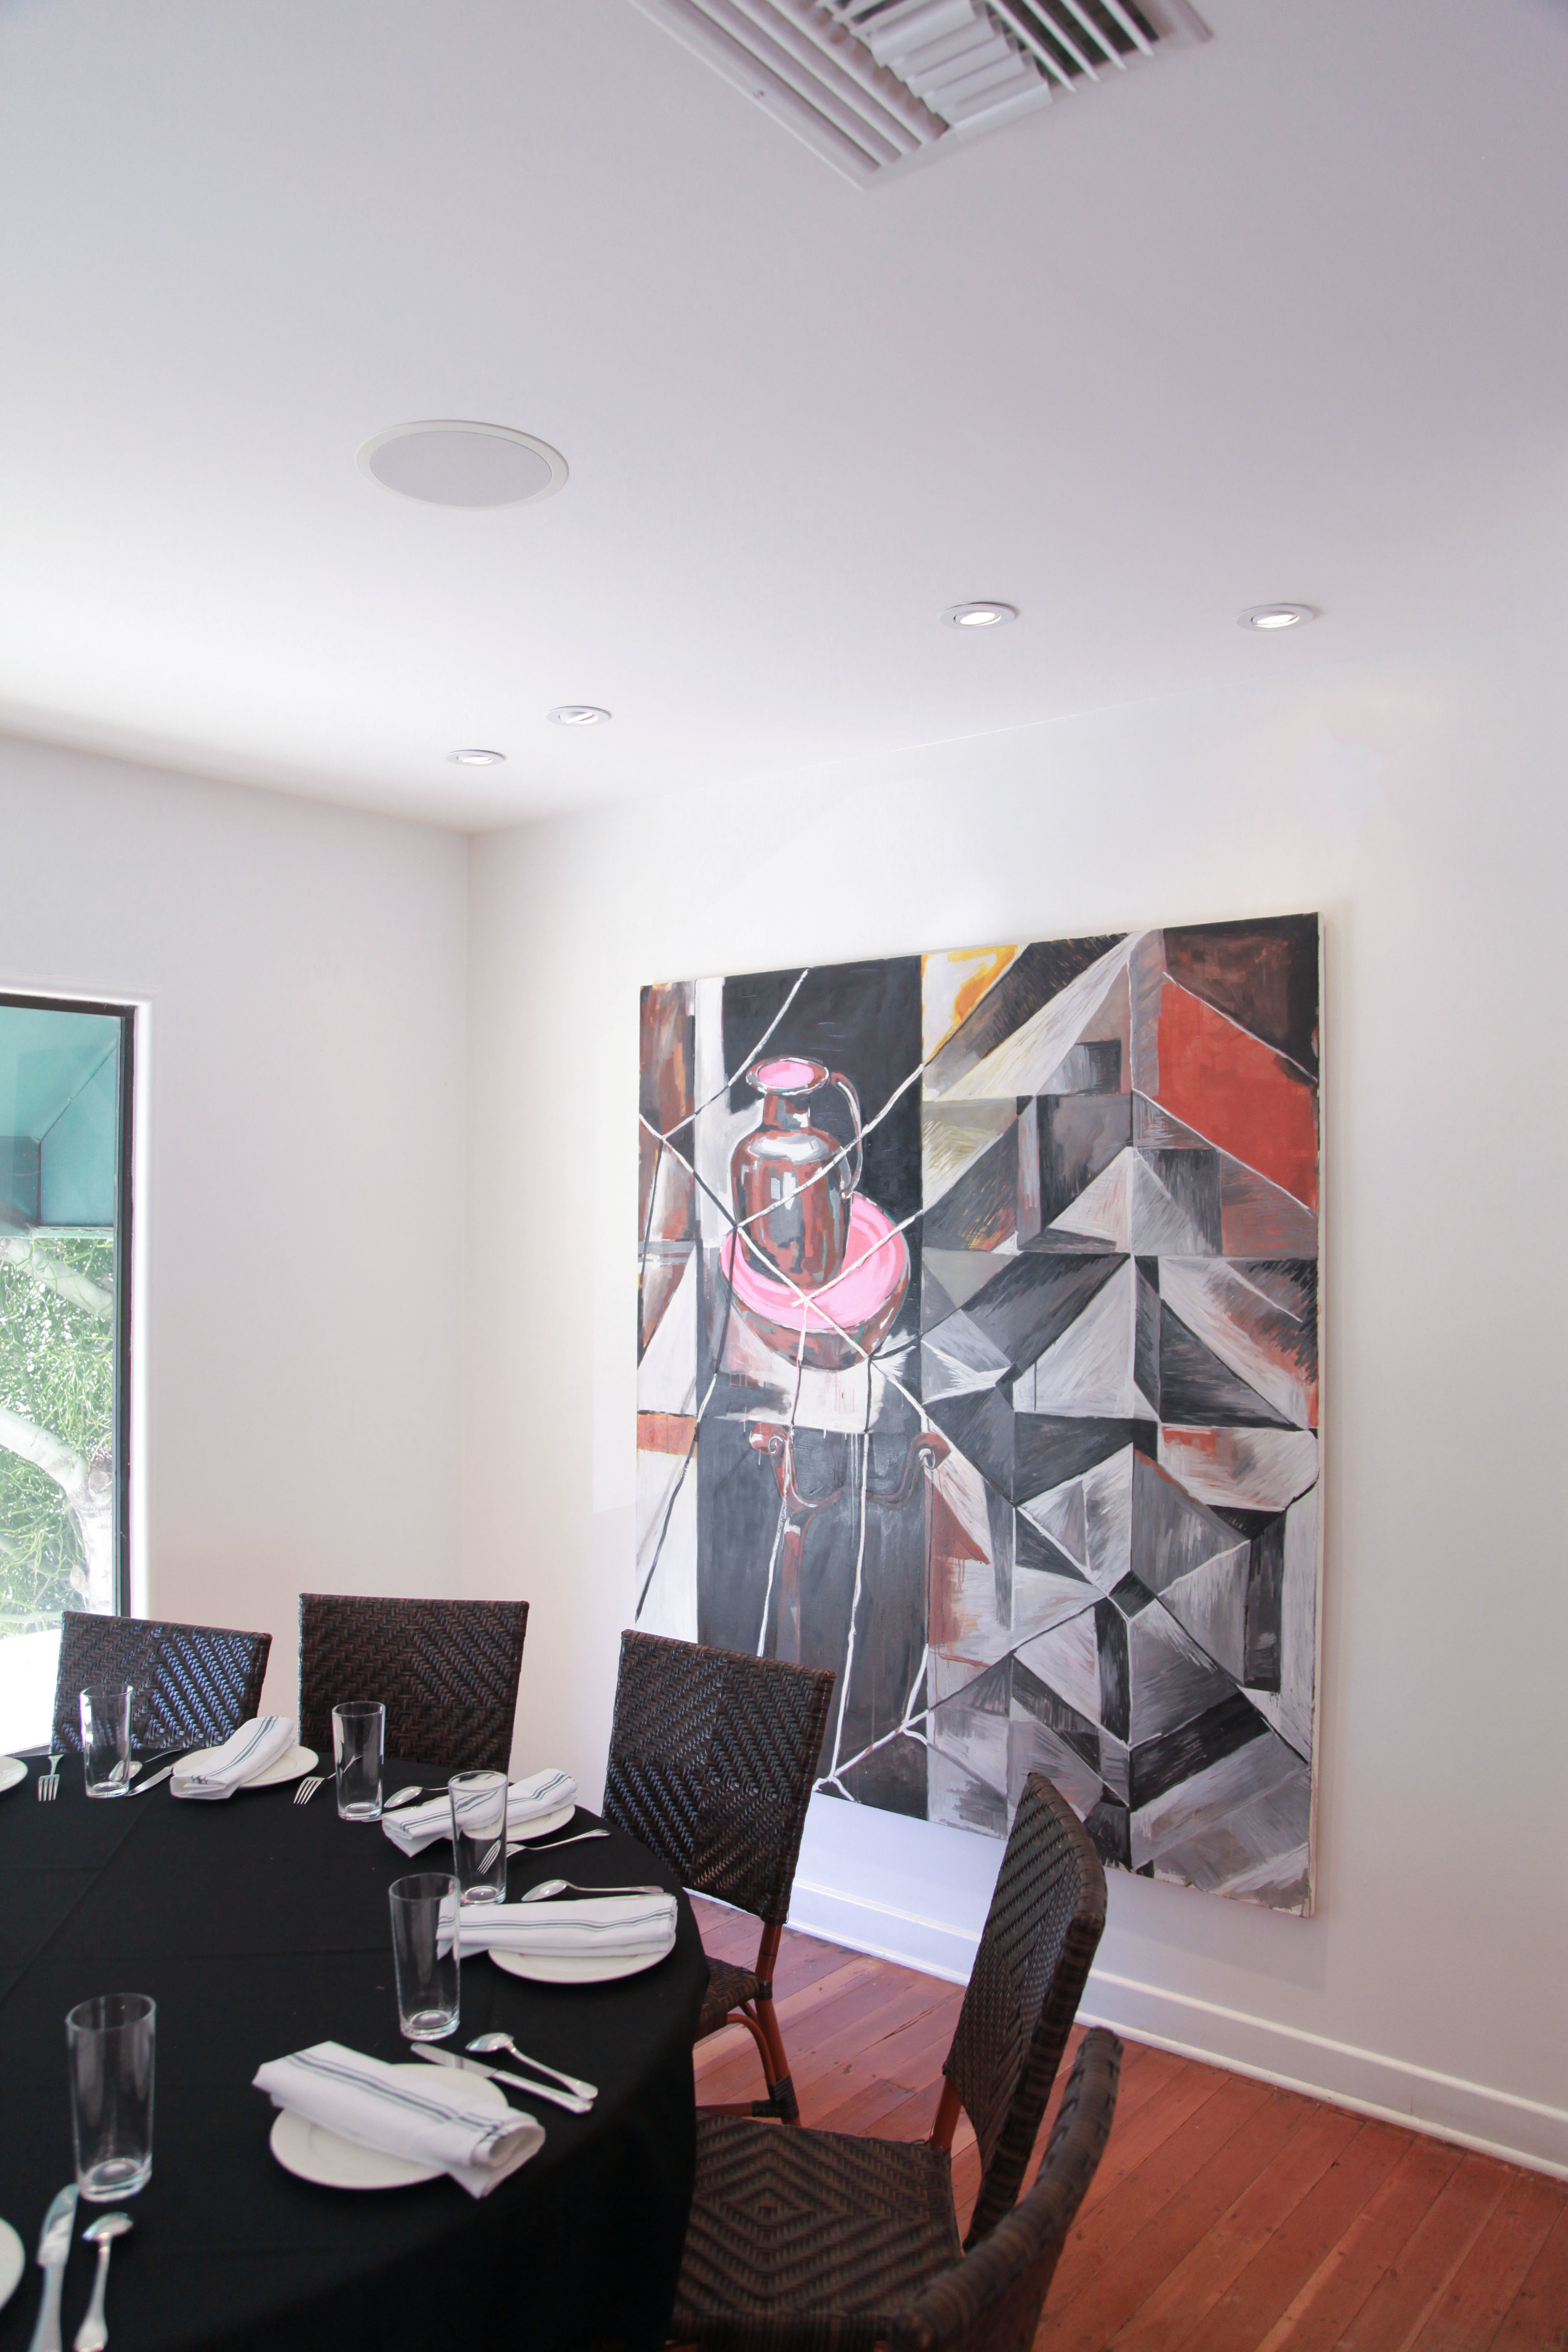 Installation view: Alastair Mackinven